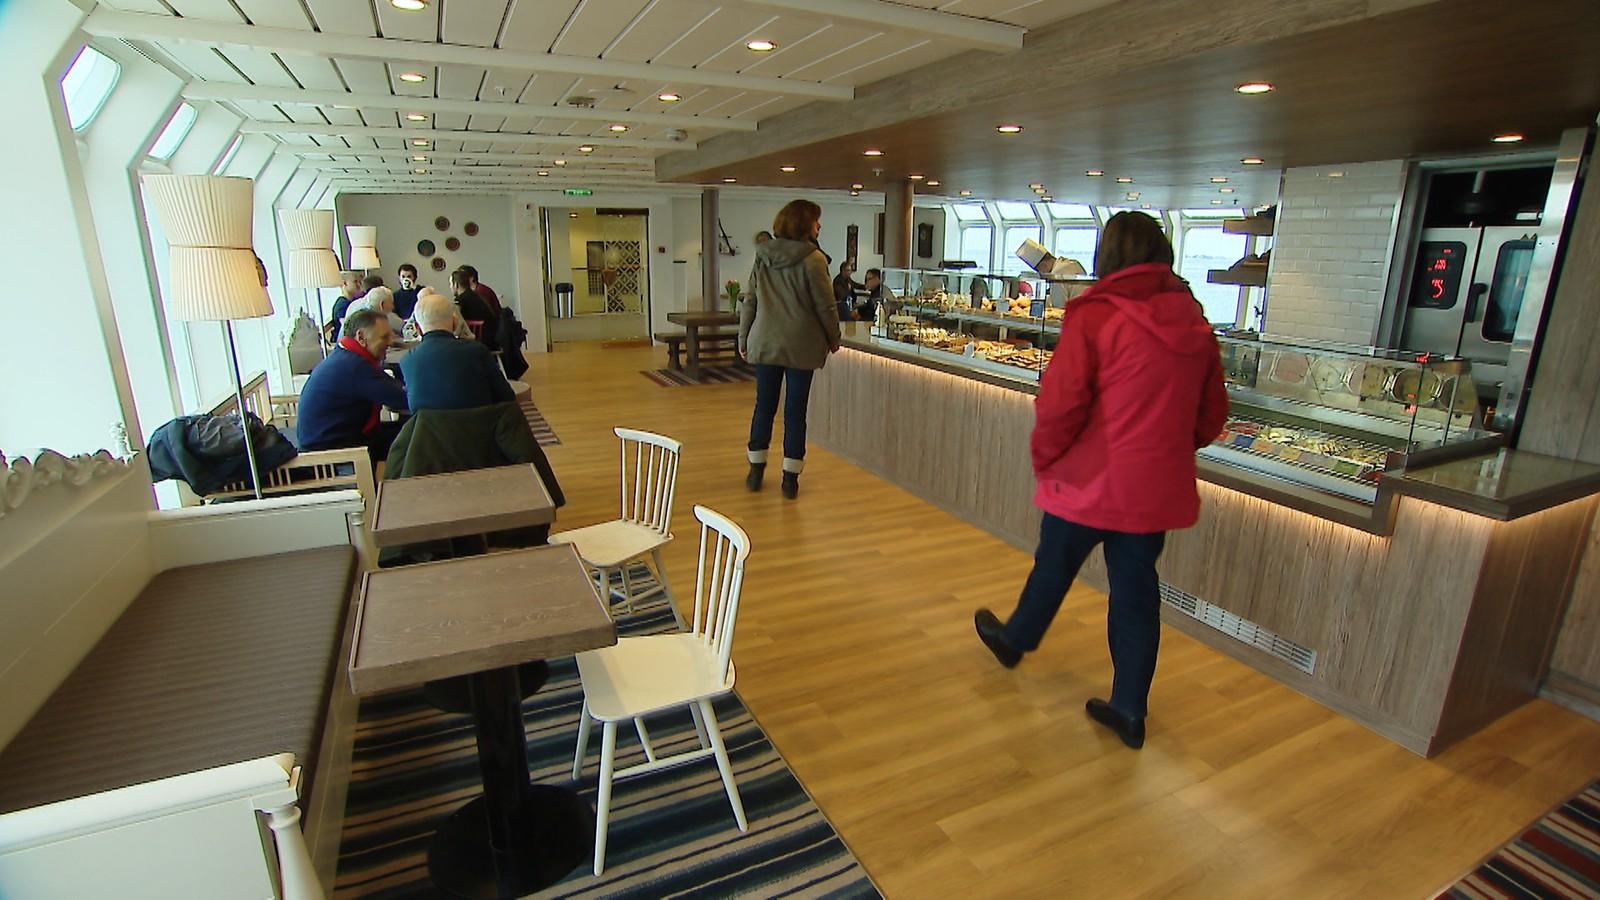 Multe bakeri, en populære kafé på hurtigruta «Kong Harald».